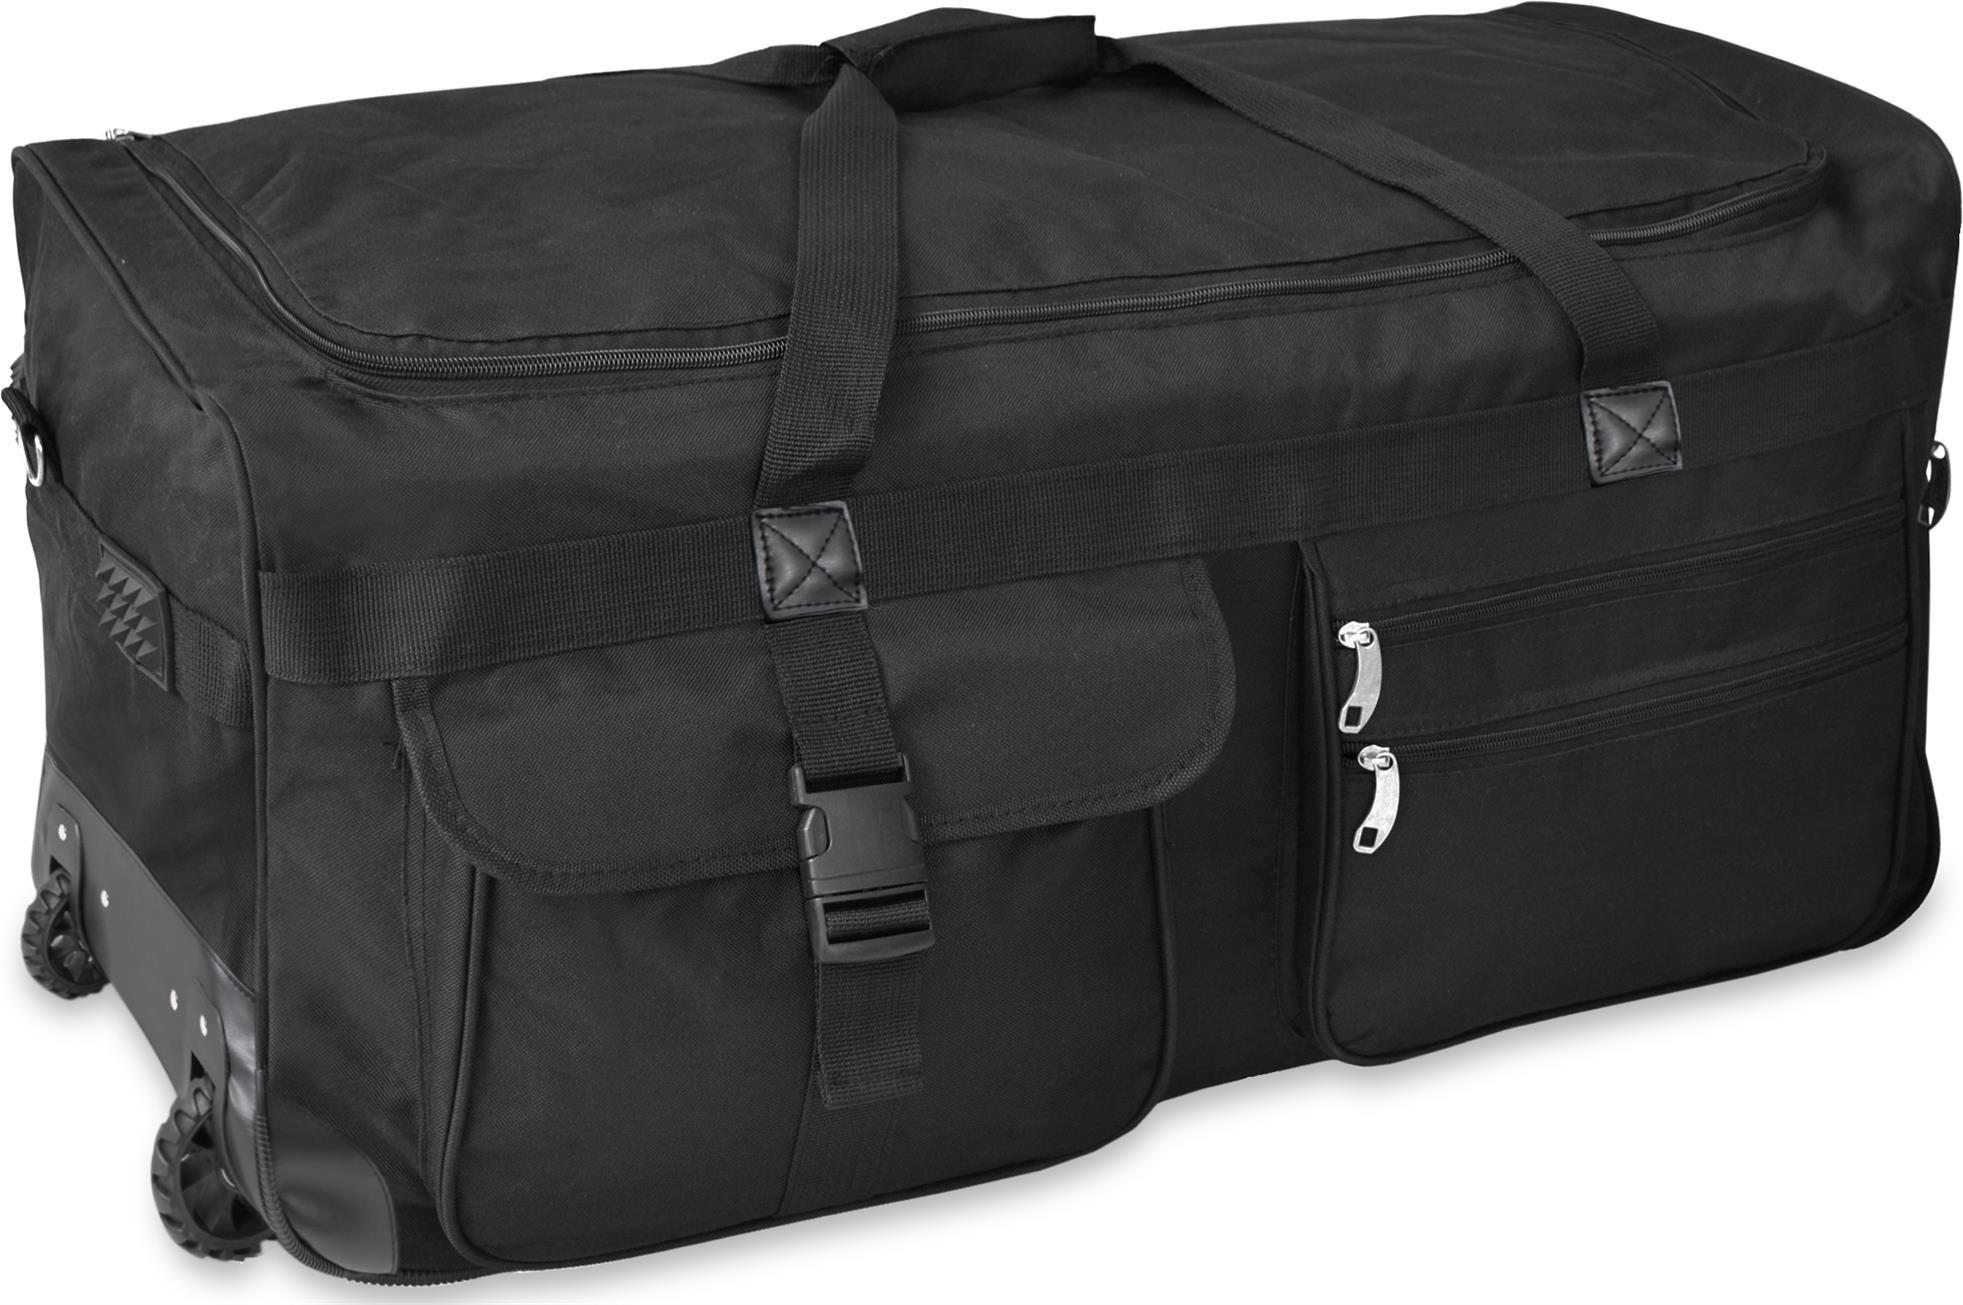 GearUp-Extra-groer-Trolley-Reisekoffer-Reisetasche-80-100-120-oder-150-Liter-whlbar